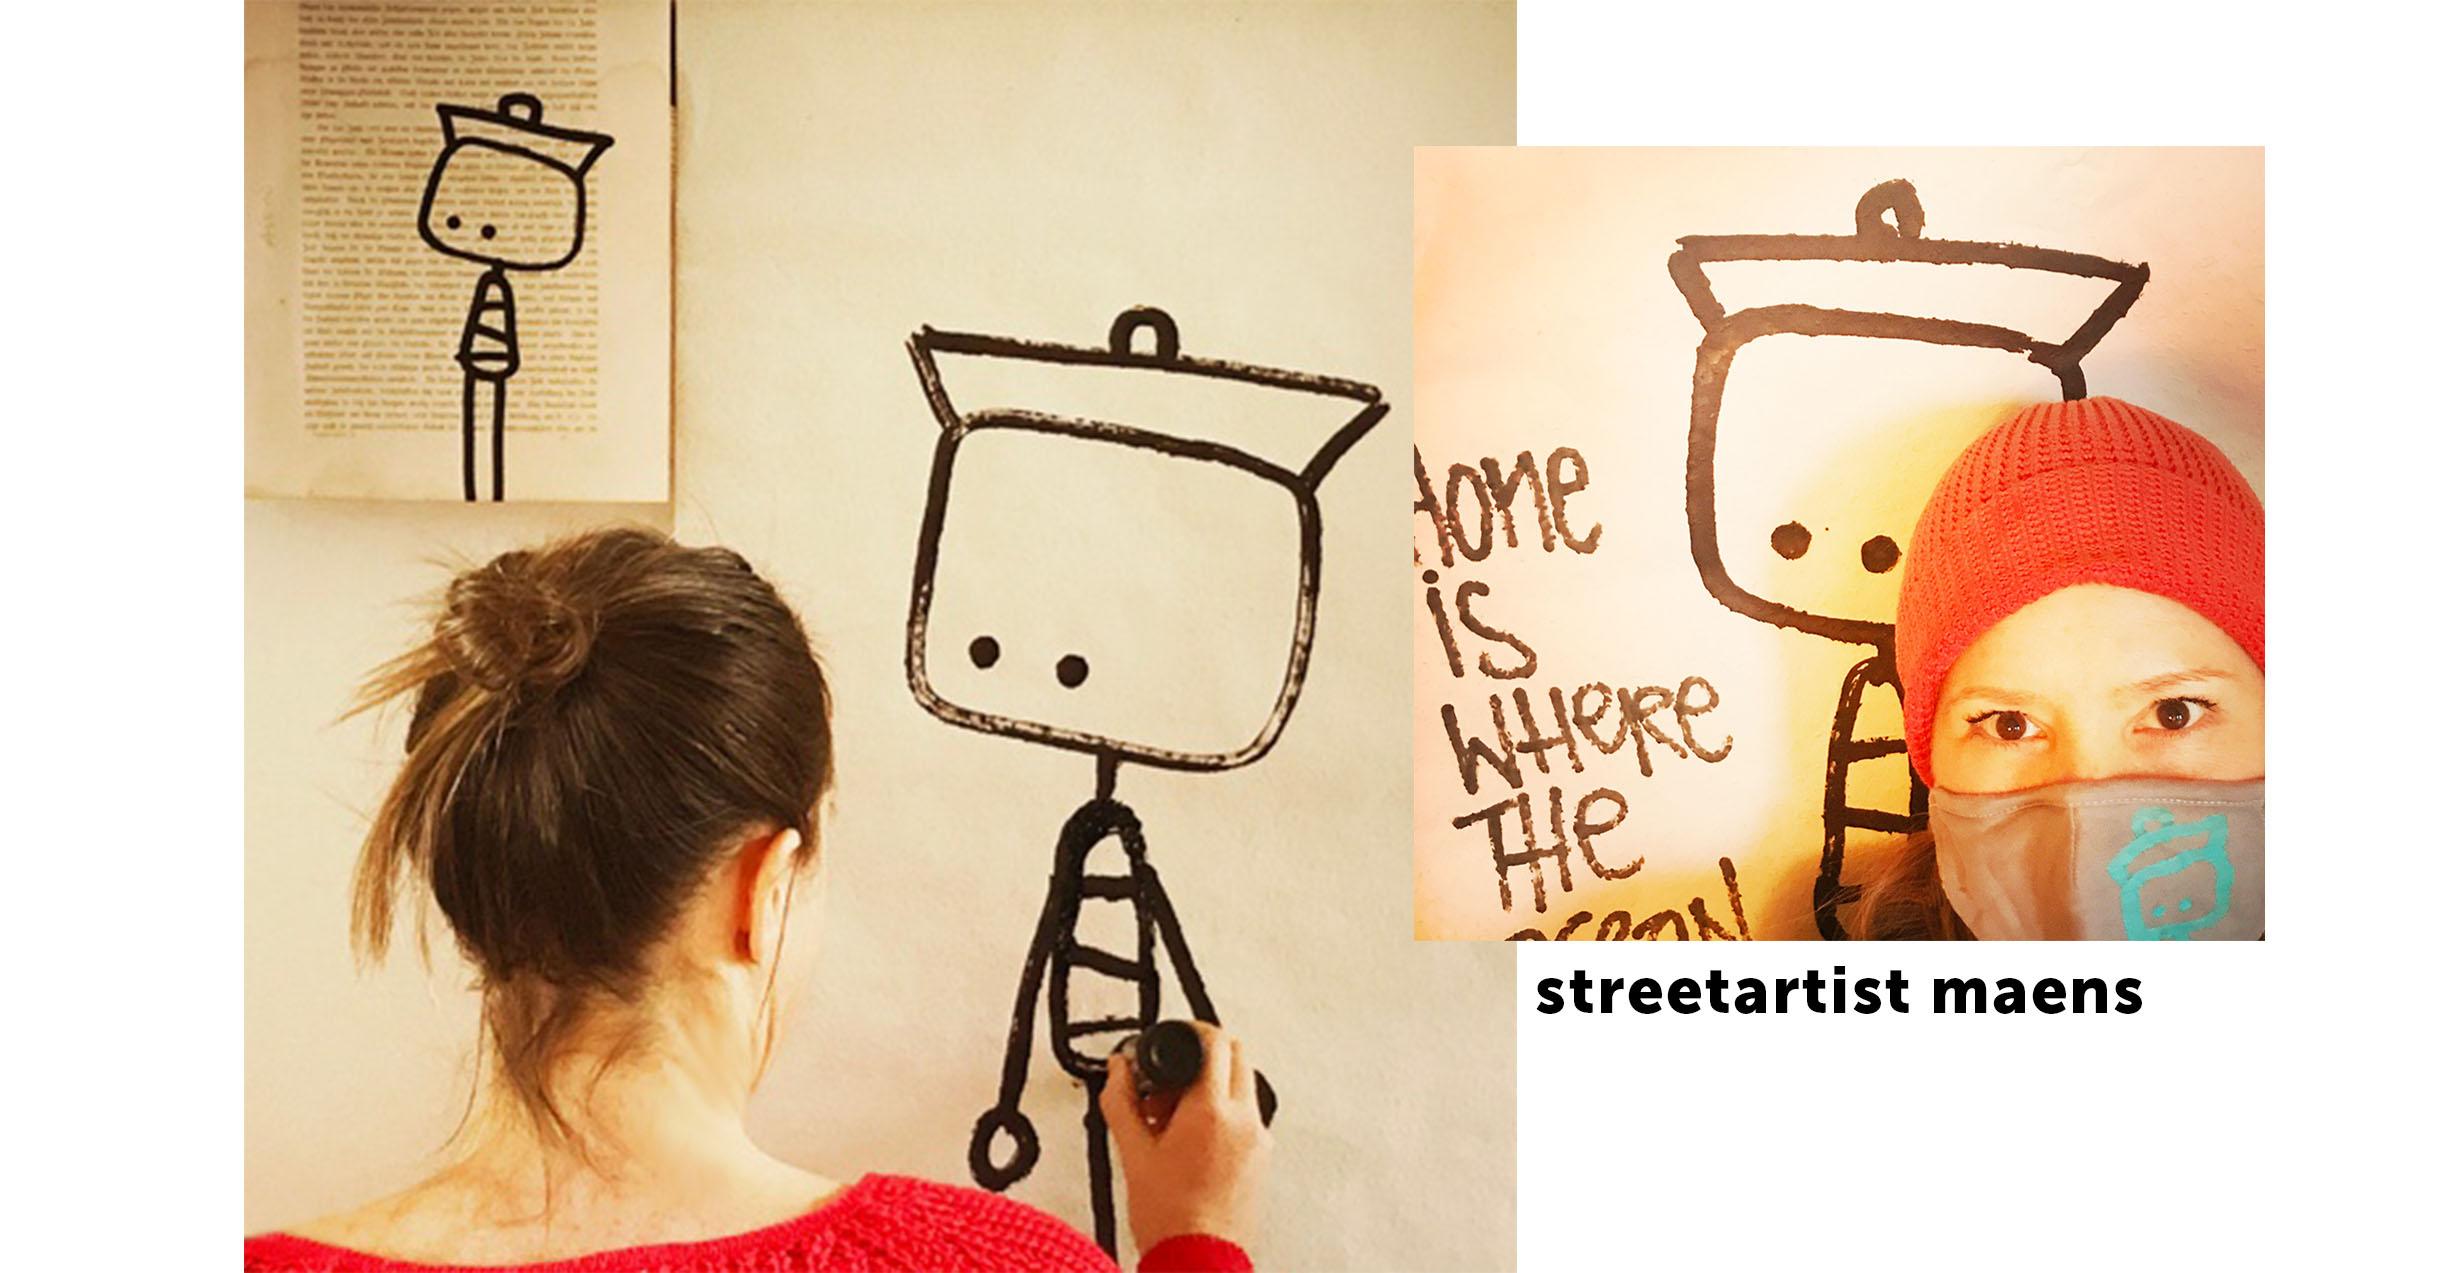 streetartist-maens-glastrinkflasche-soulbottles-unity-soulblog